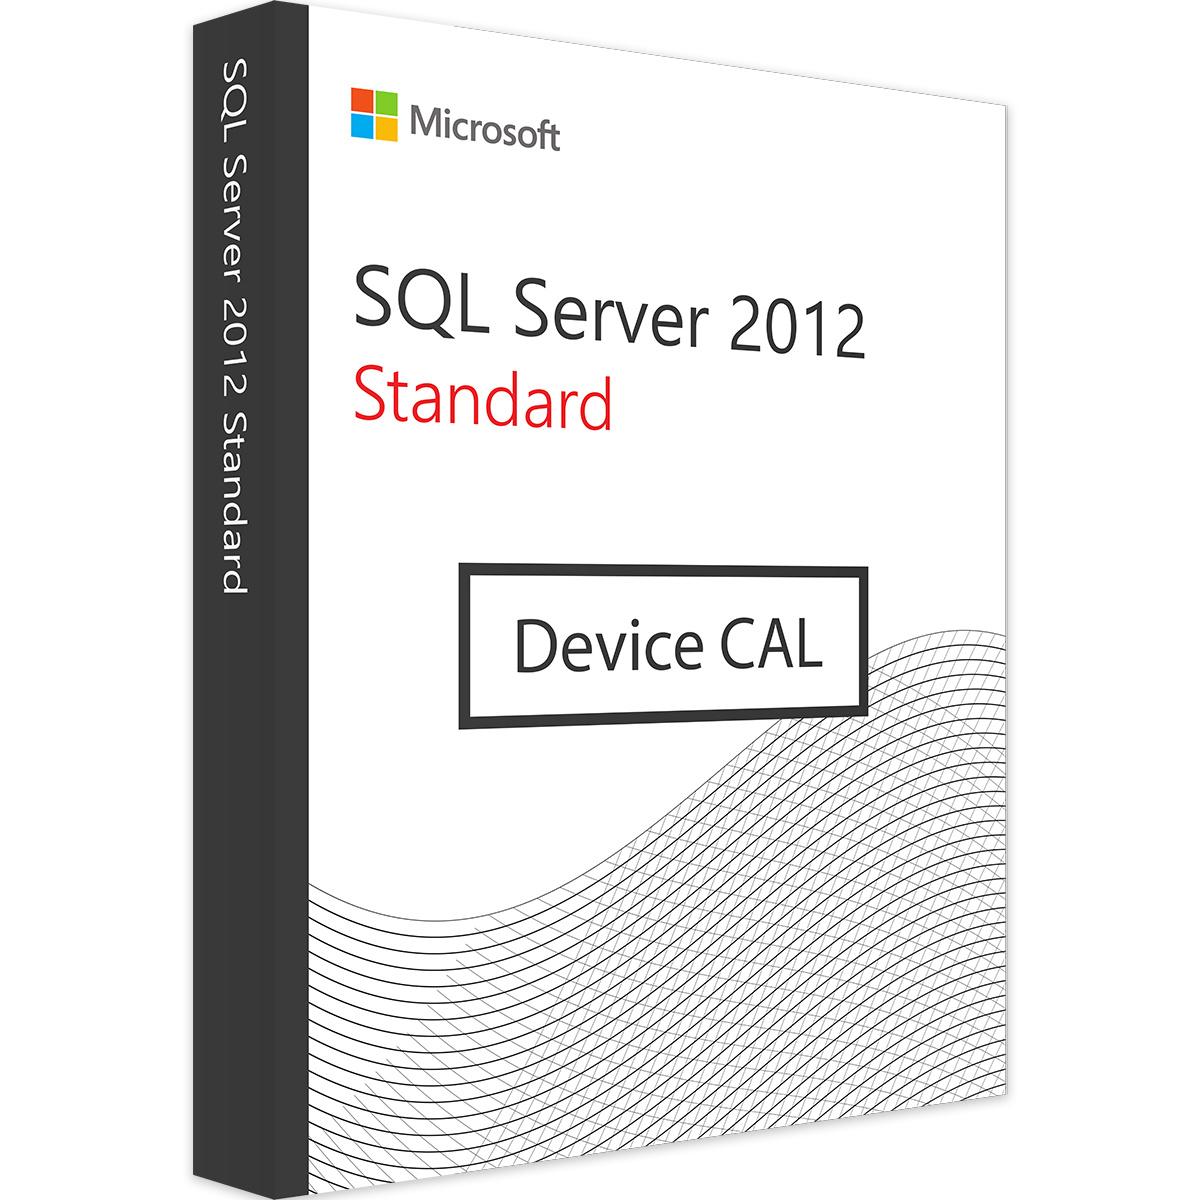 Microsoft SQL Server 2012 Device CAL - Microsoft Open License